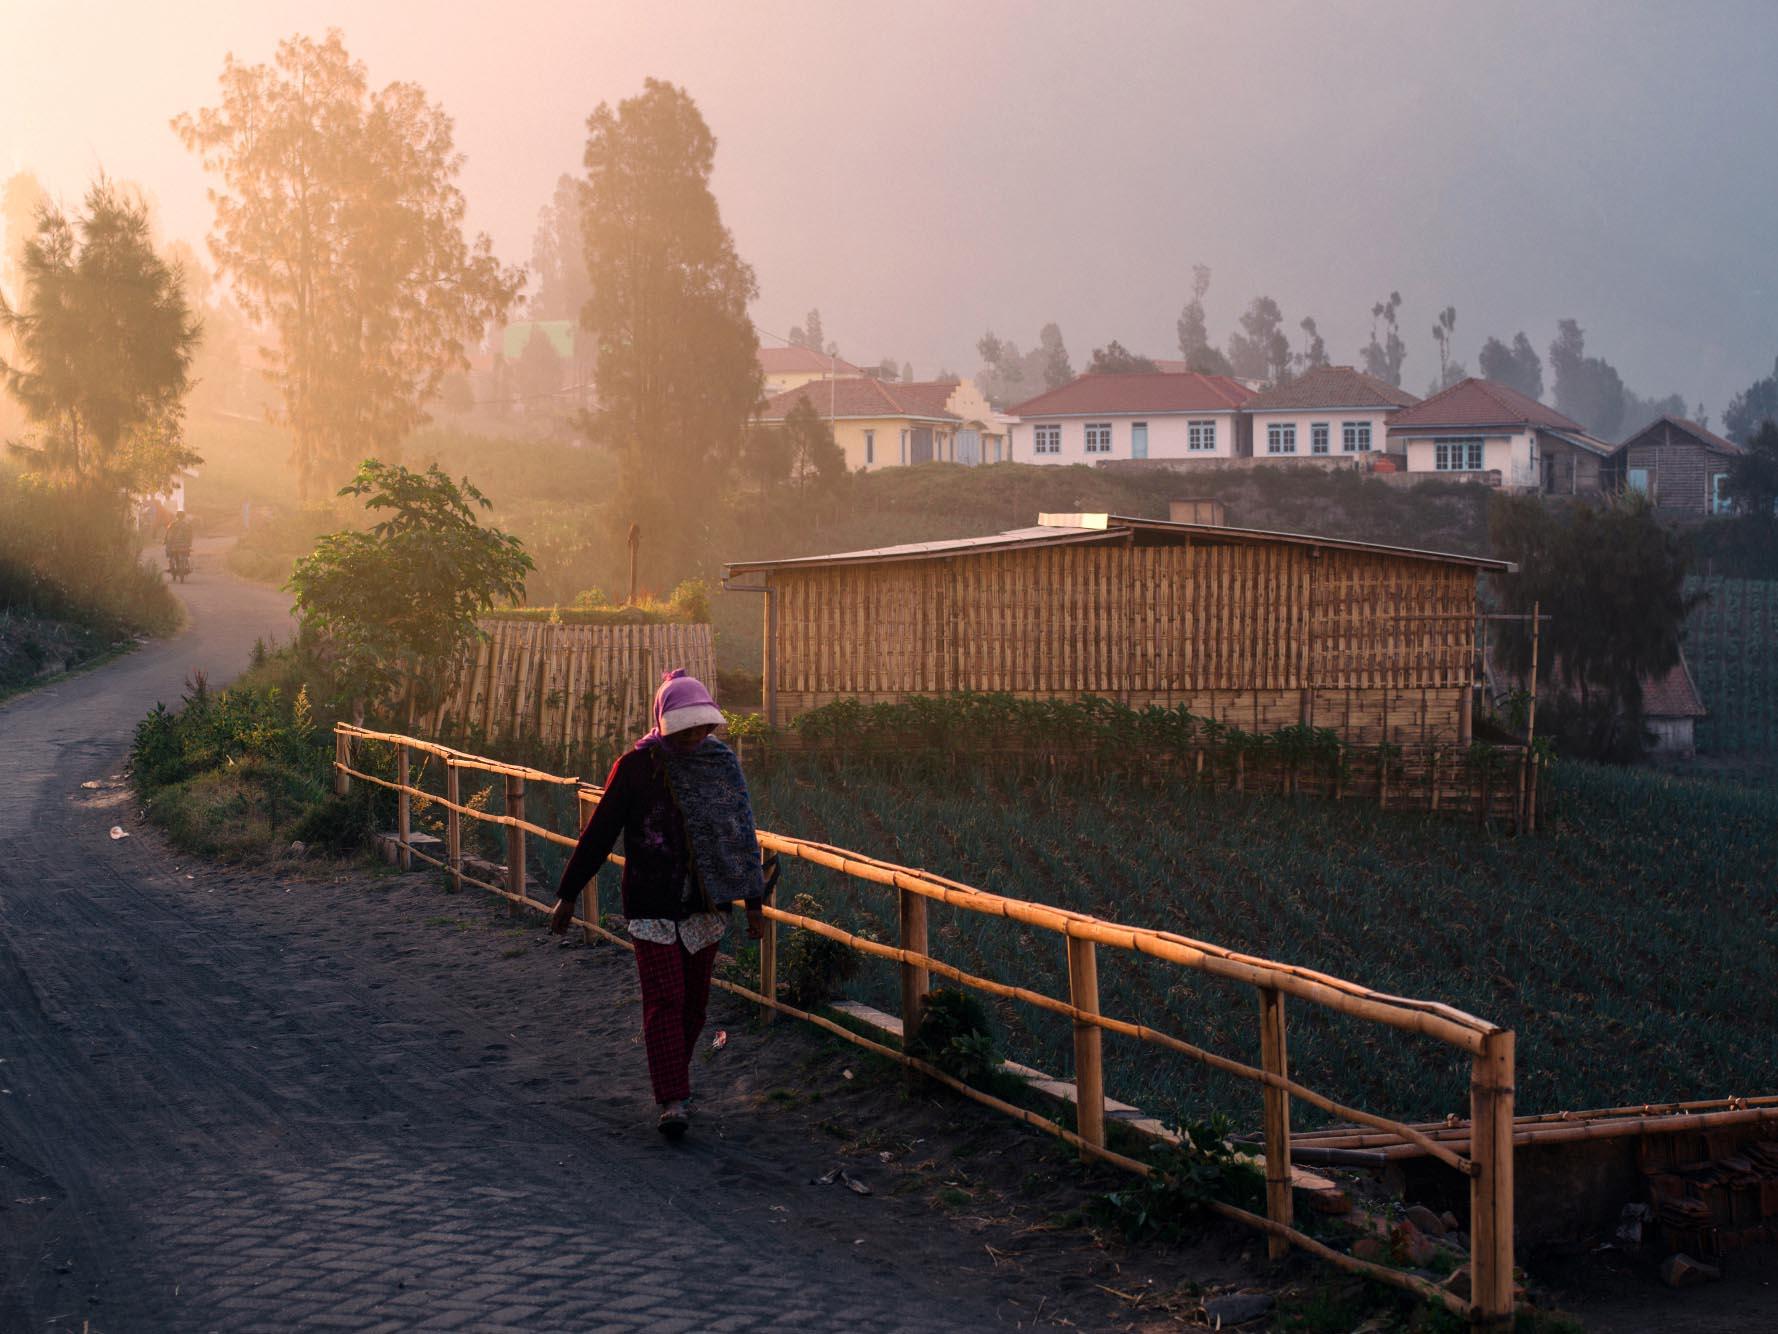 Sunset in Cemoro Lawang.